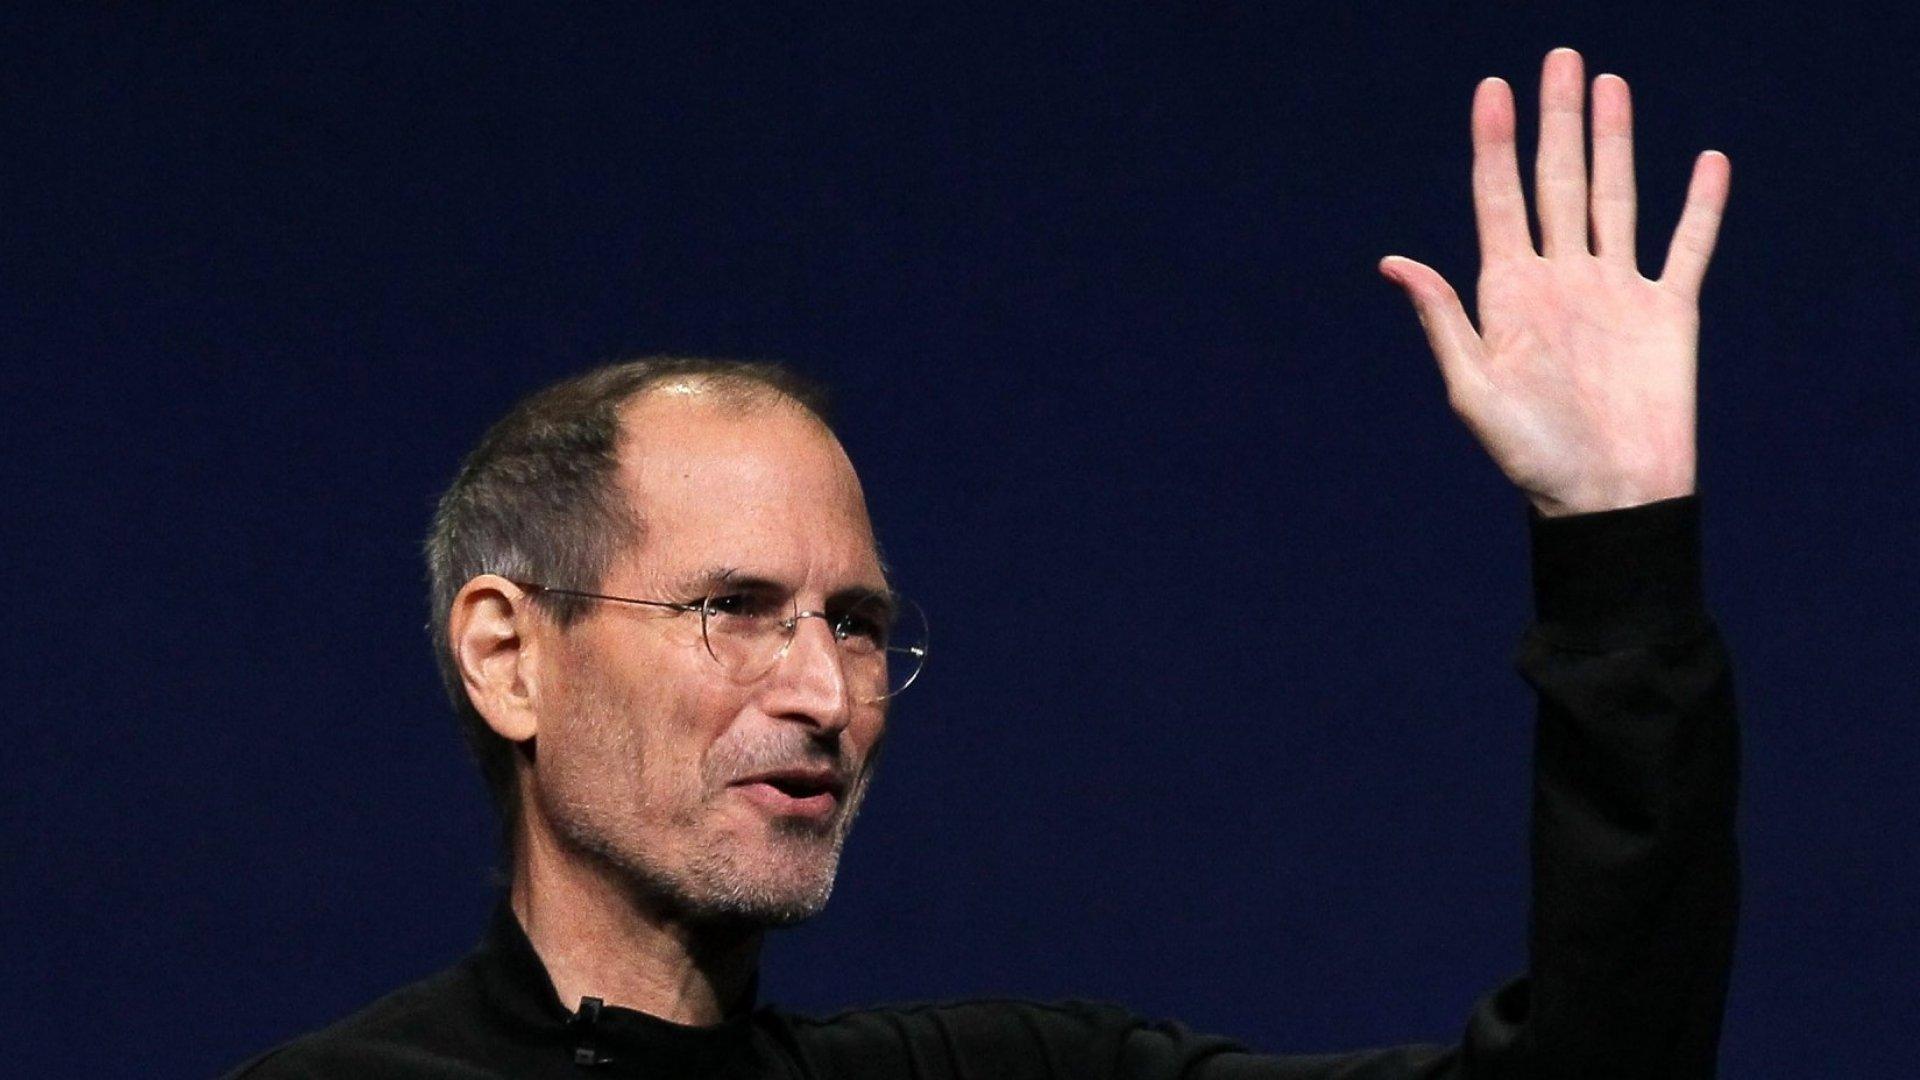 Steve Jobs's Success Secret was that he Asked Often for Help